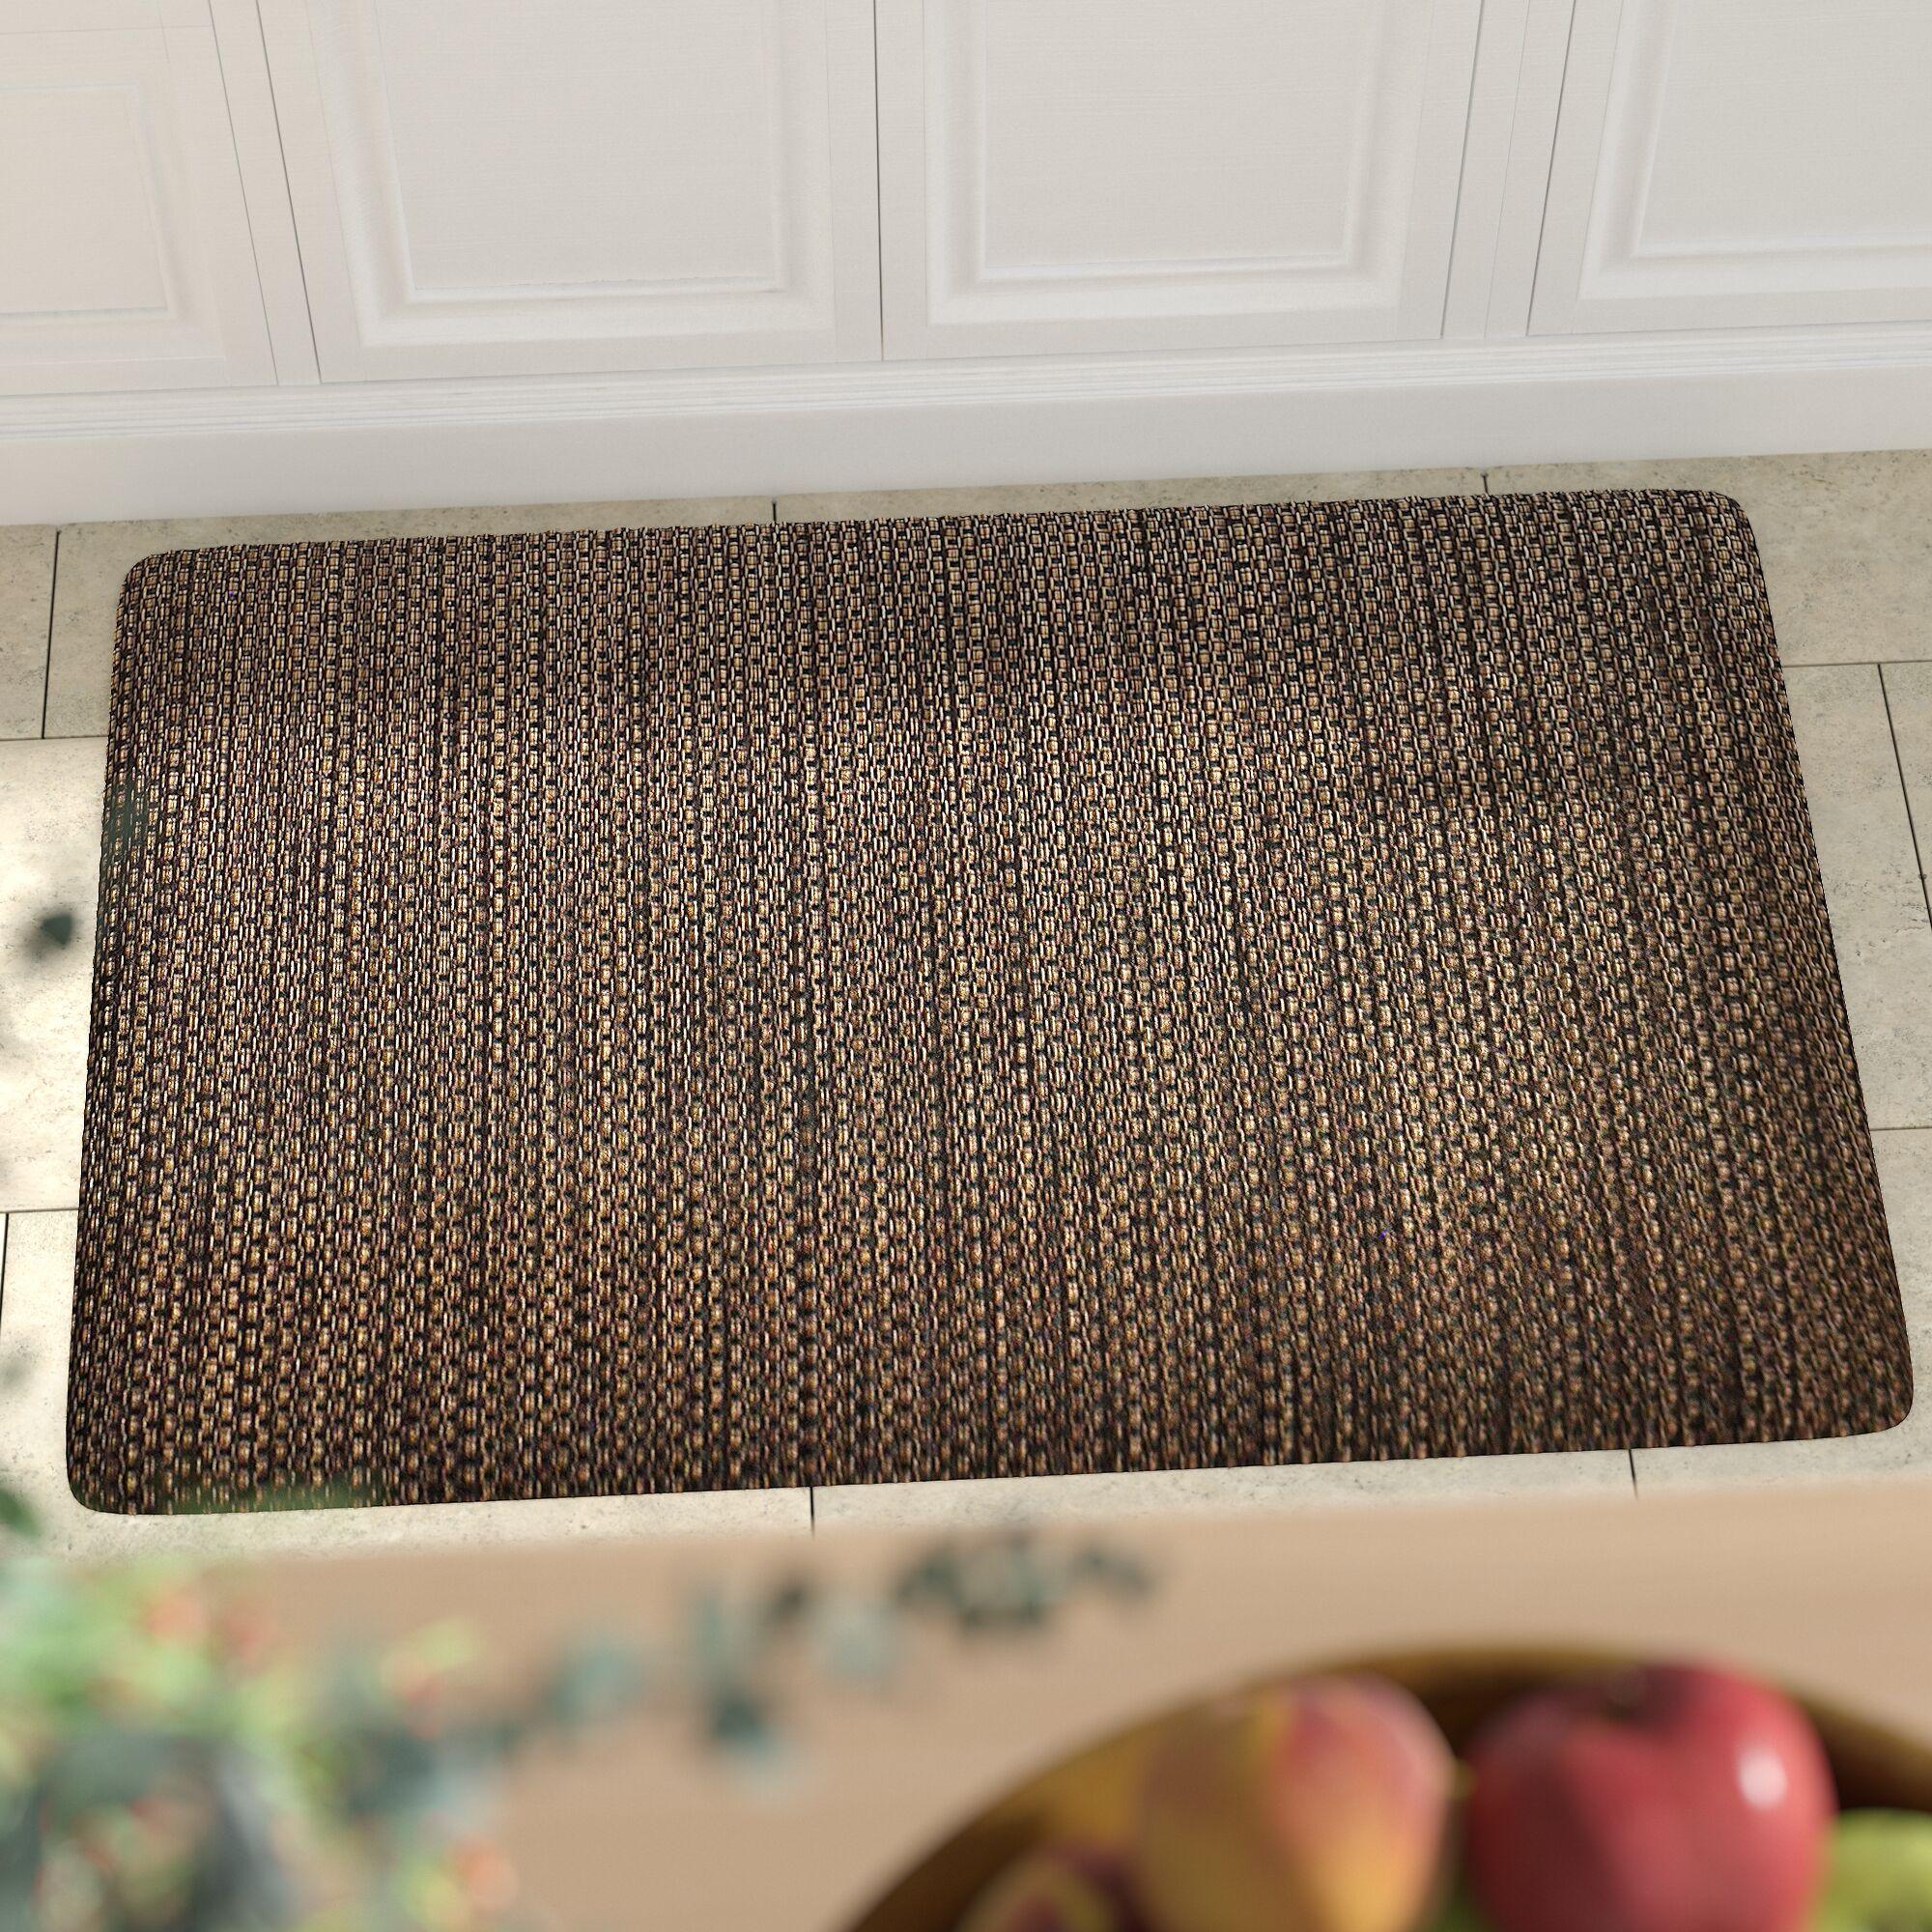 Torrick Comfort Kitchen Mat Mat Size: Rectangle 2' x 6', Color: Black Wicker